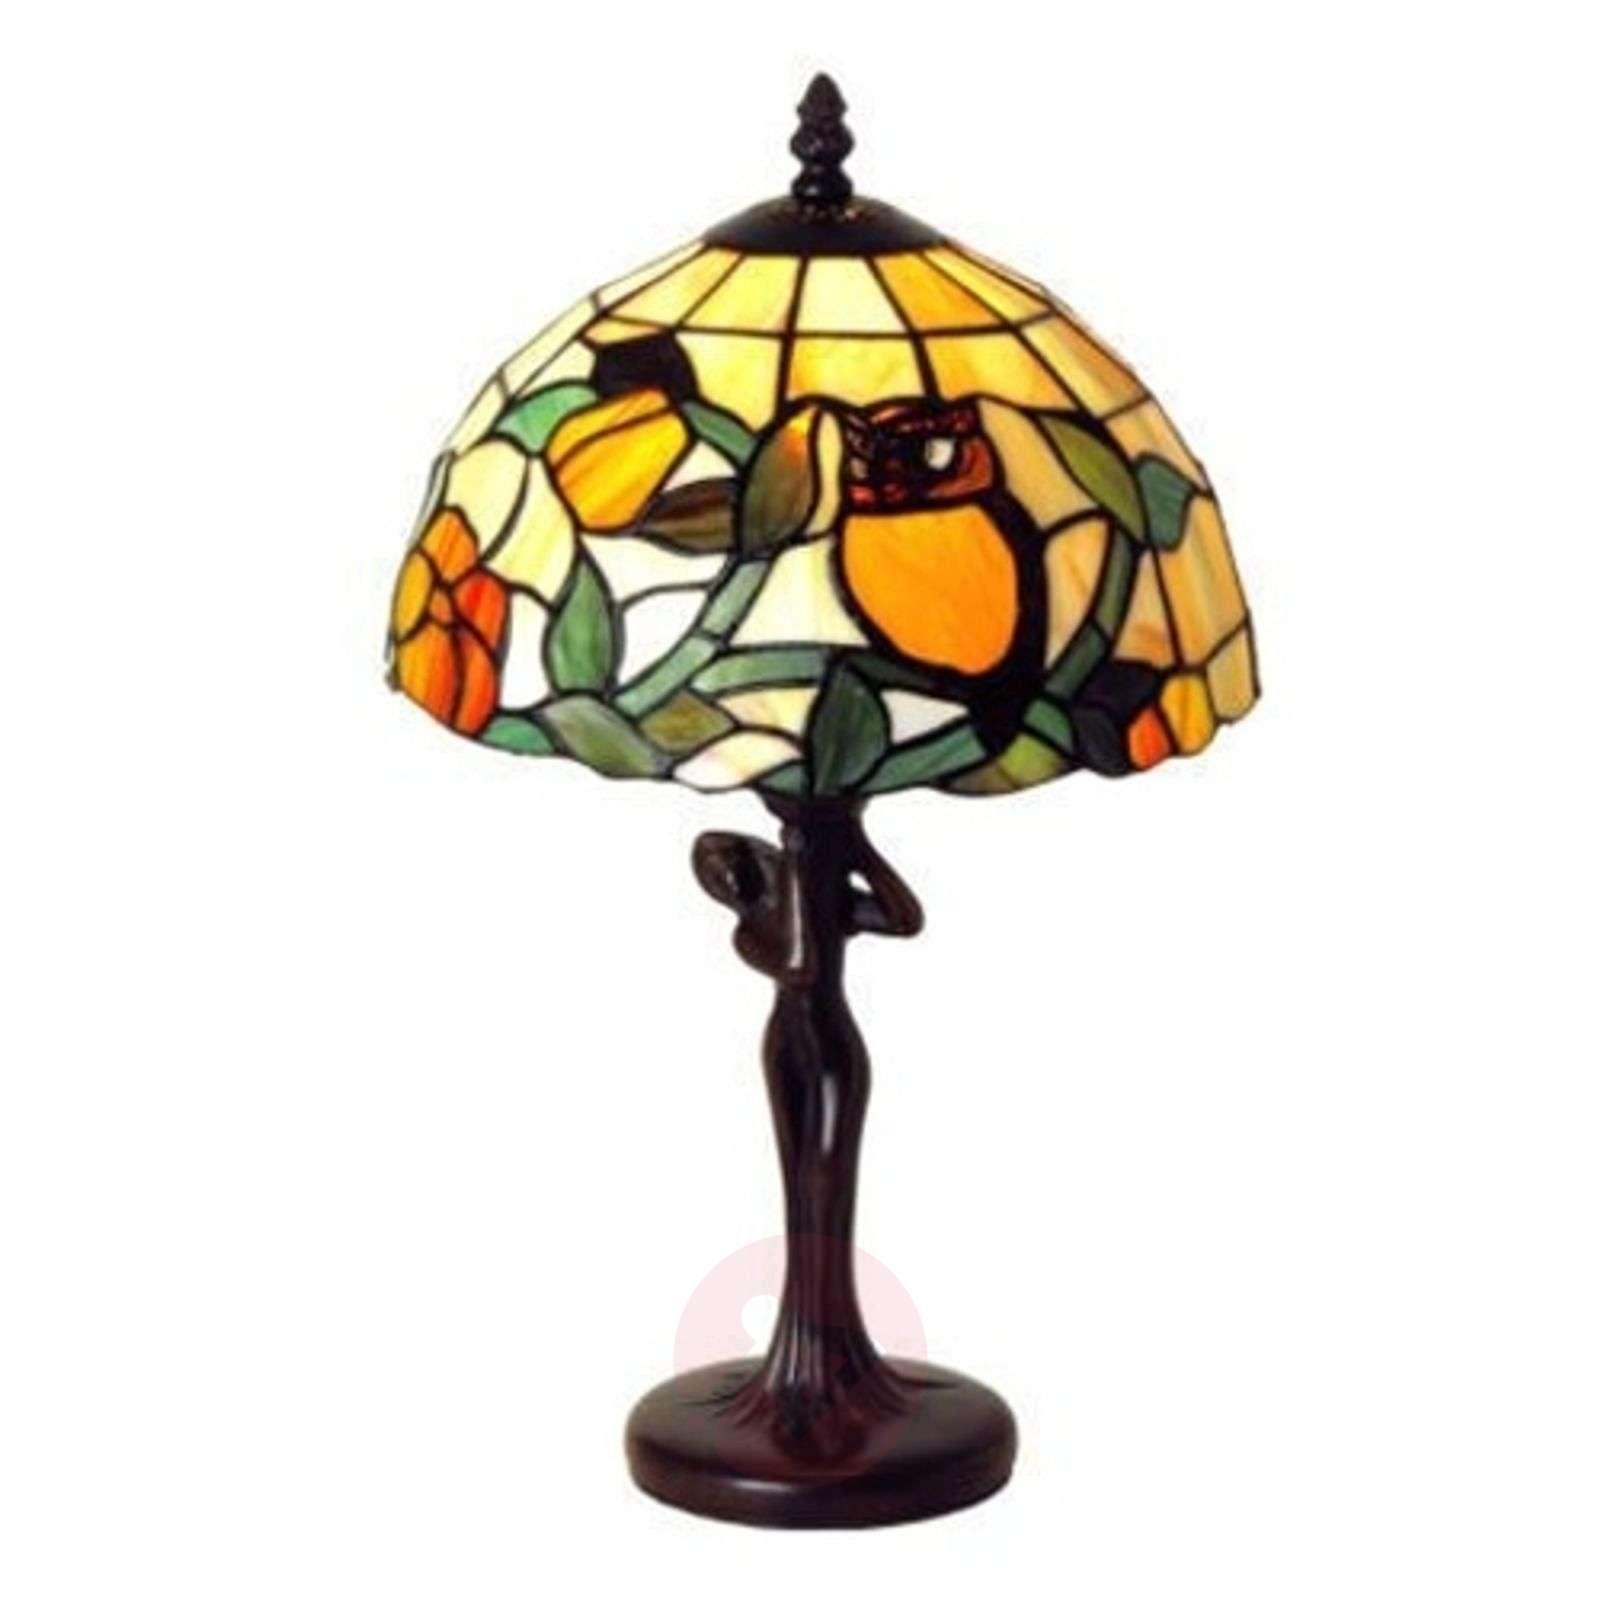 LIEKE table lamp in tje Tiffany style-1032199-01